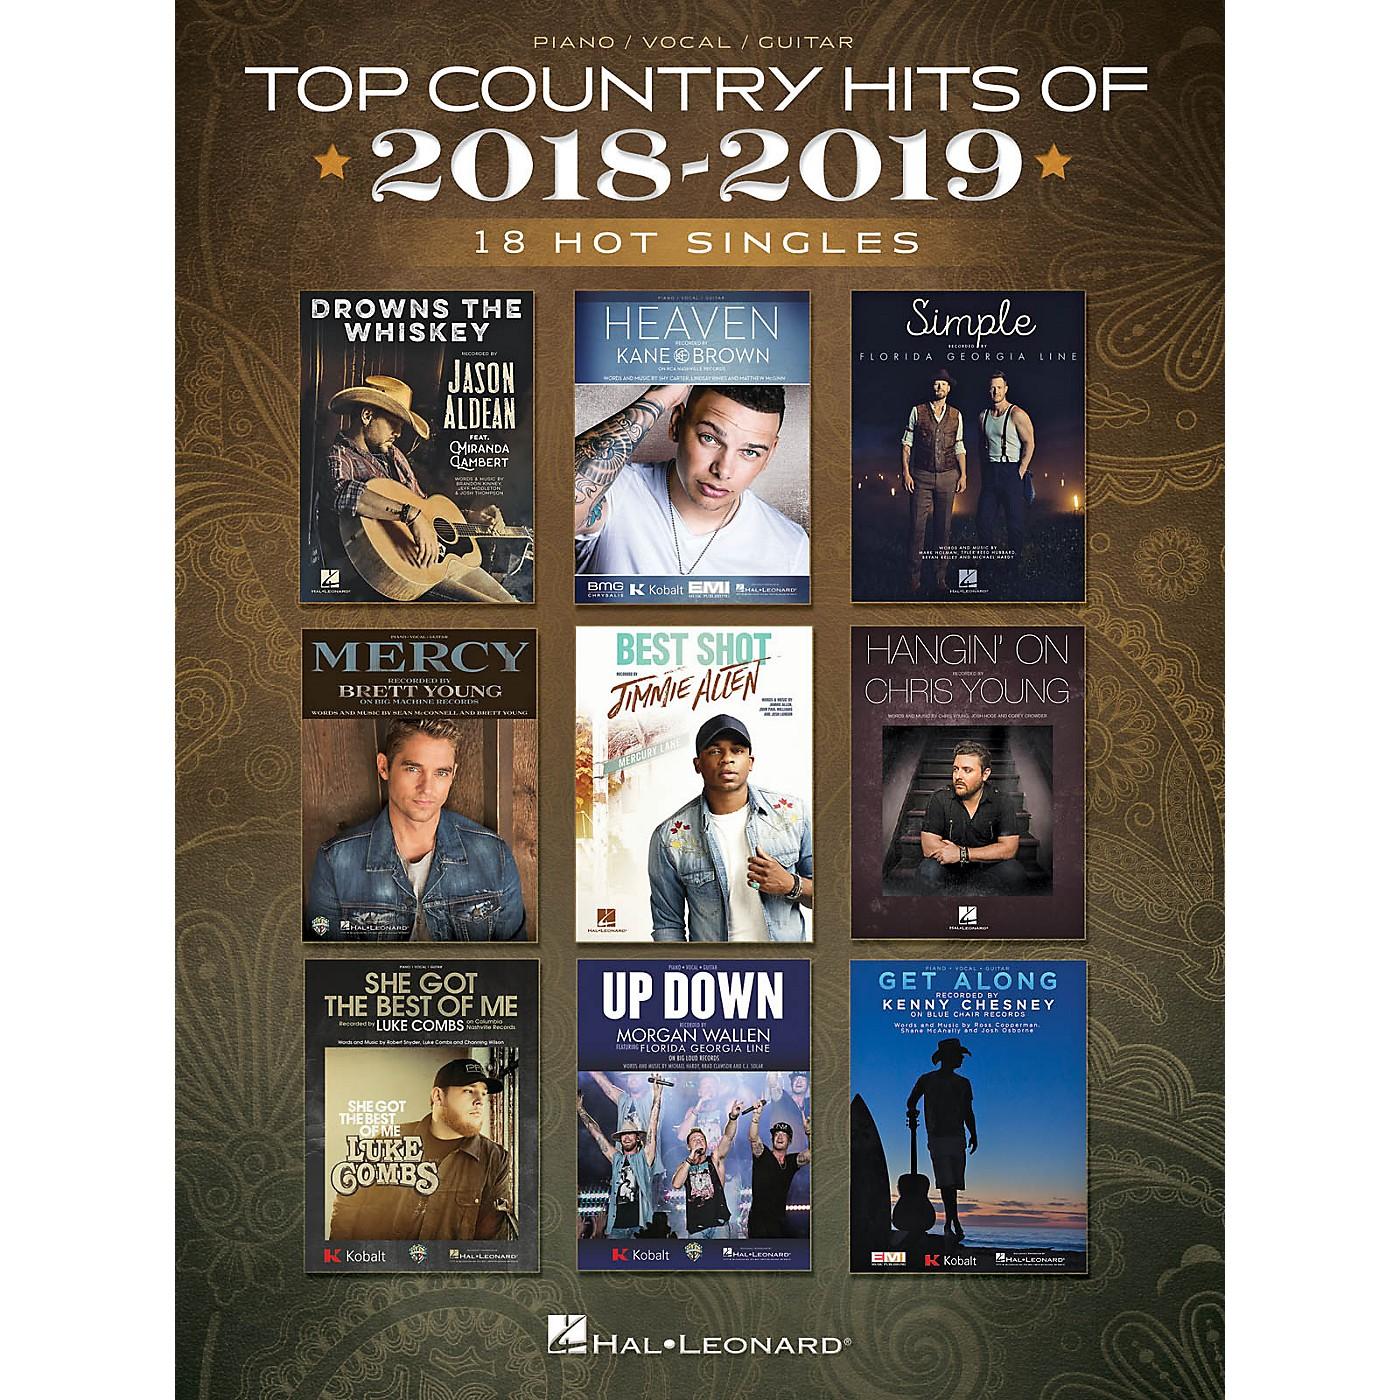 Hal Leonard Top Country Hits of 2018-2019 (18 Hot Singles) Piano/Vocal/Guitar Songbook thumbnail